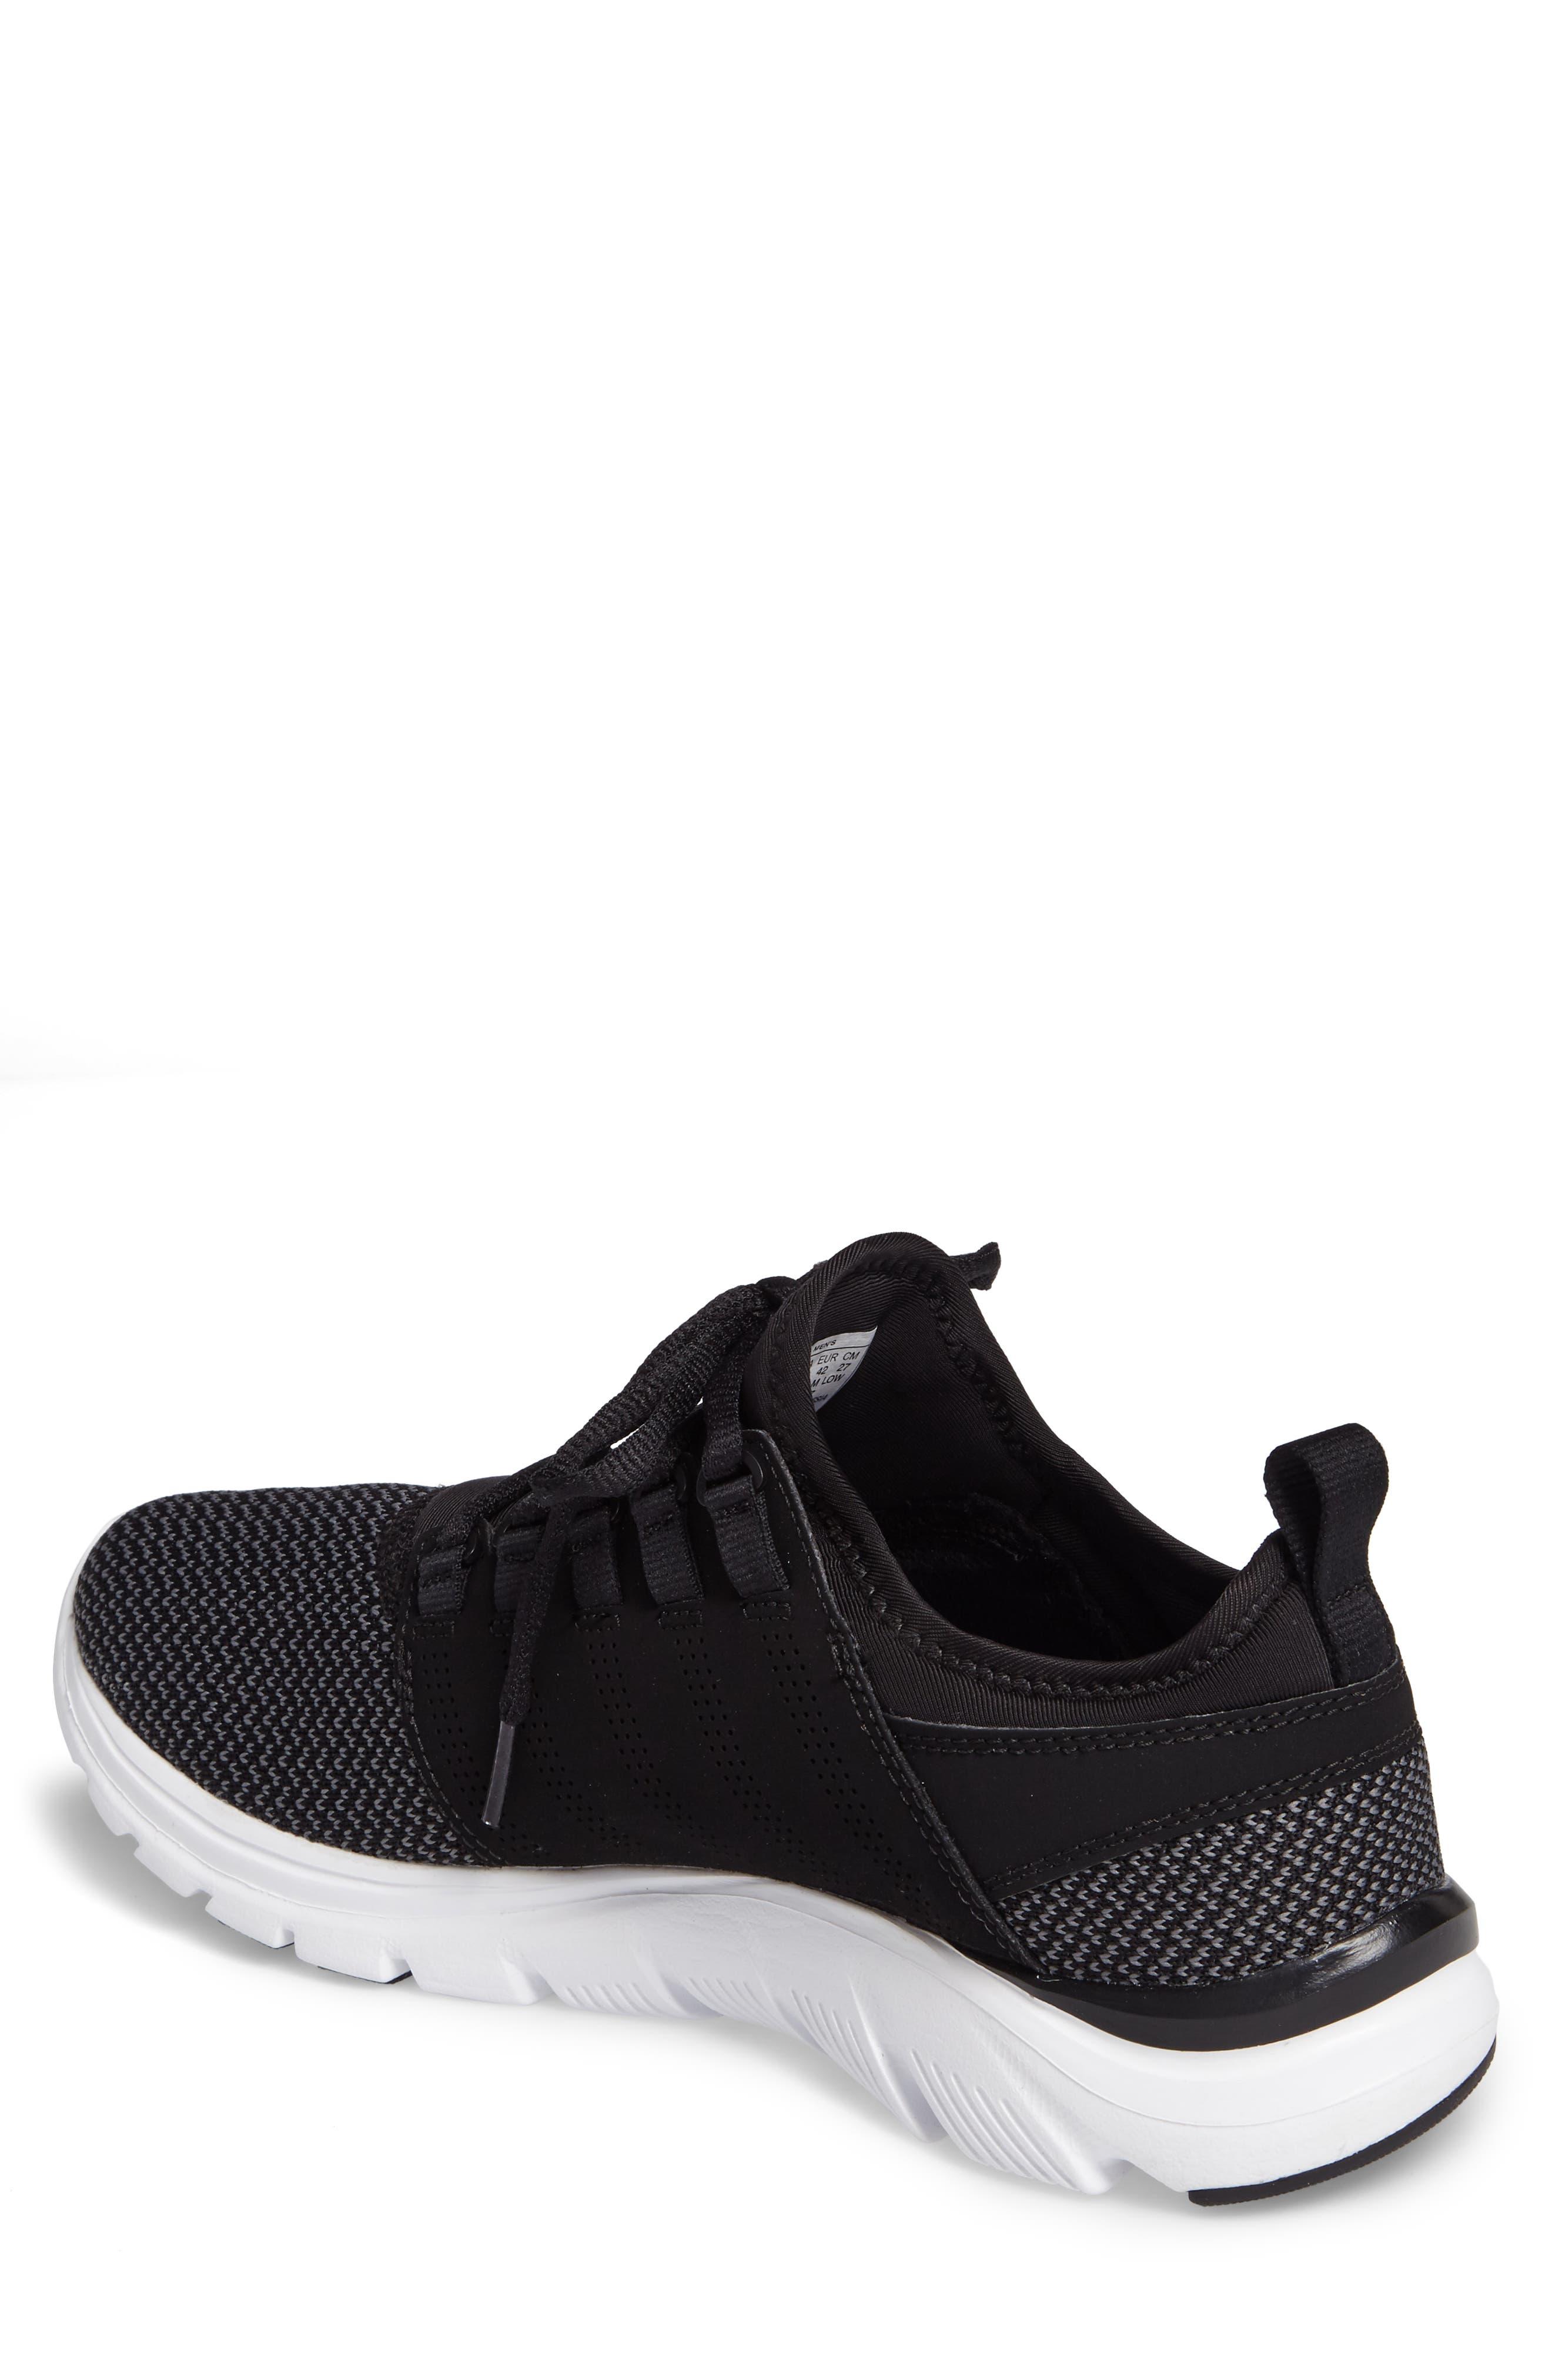 Alternate Image 2  - K-Swiss Ace Trainer CMF Sneaker (Men)